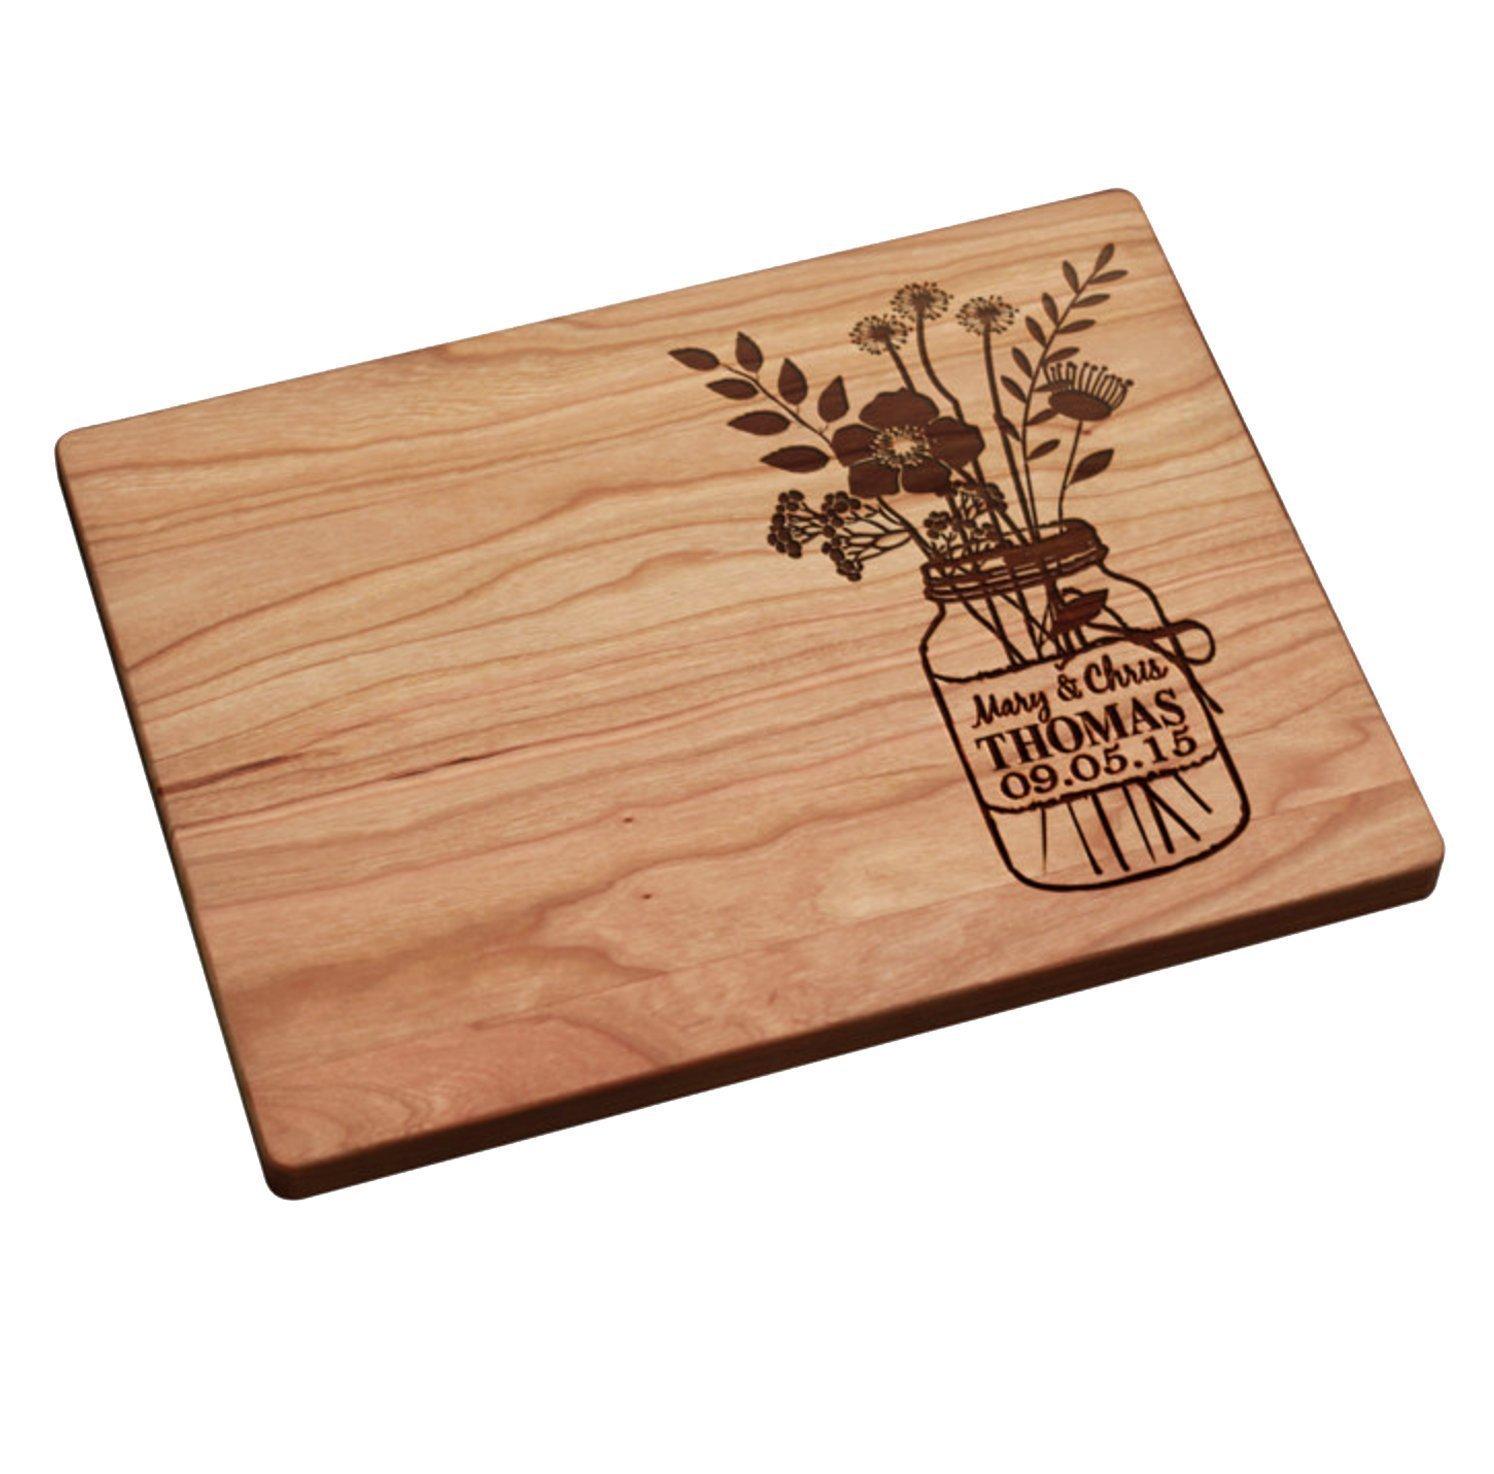 Amazoncom Personalized Cutting Board Mason Jar With Flowers